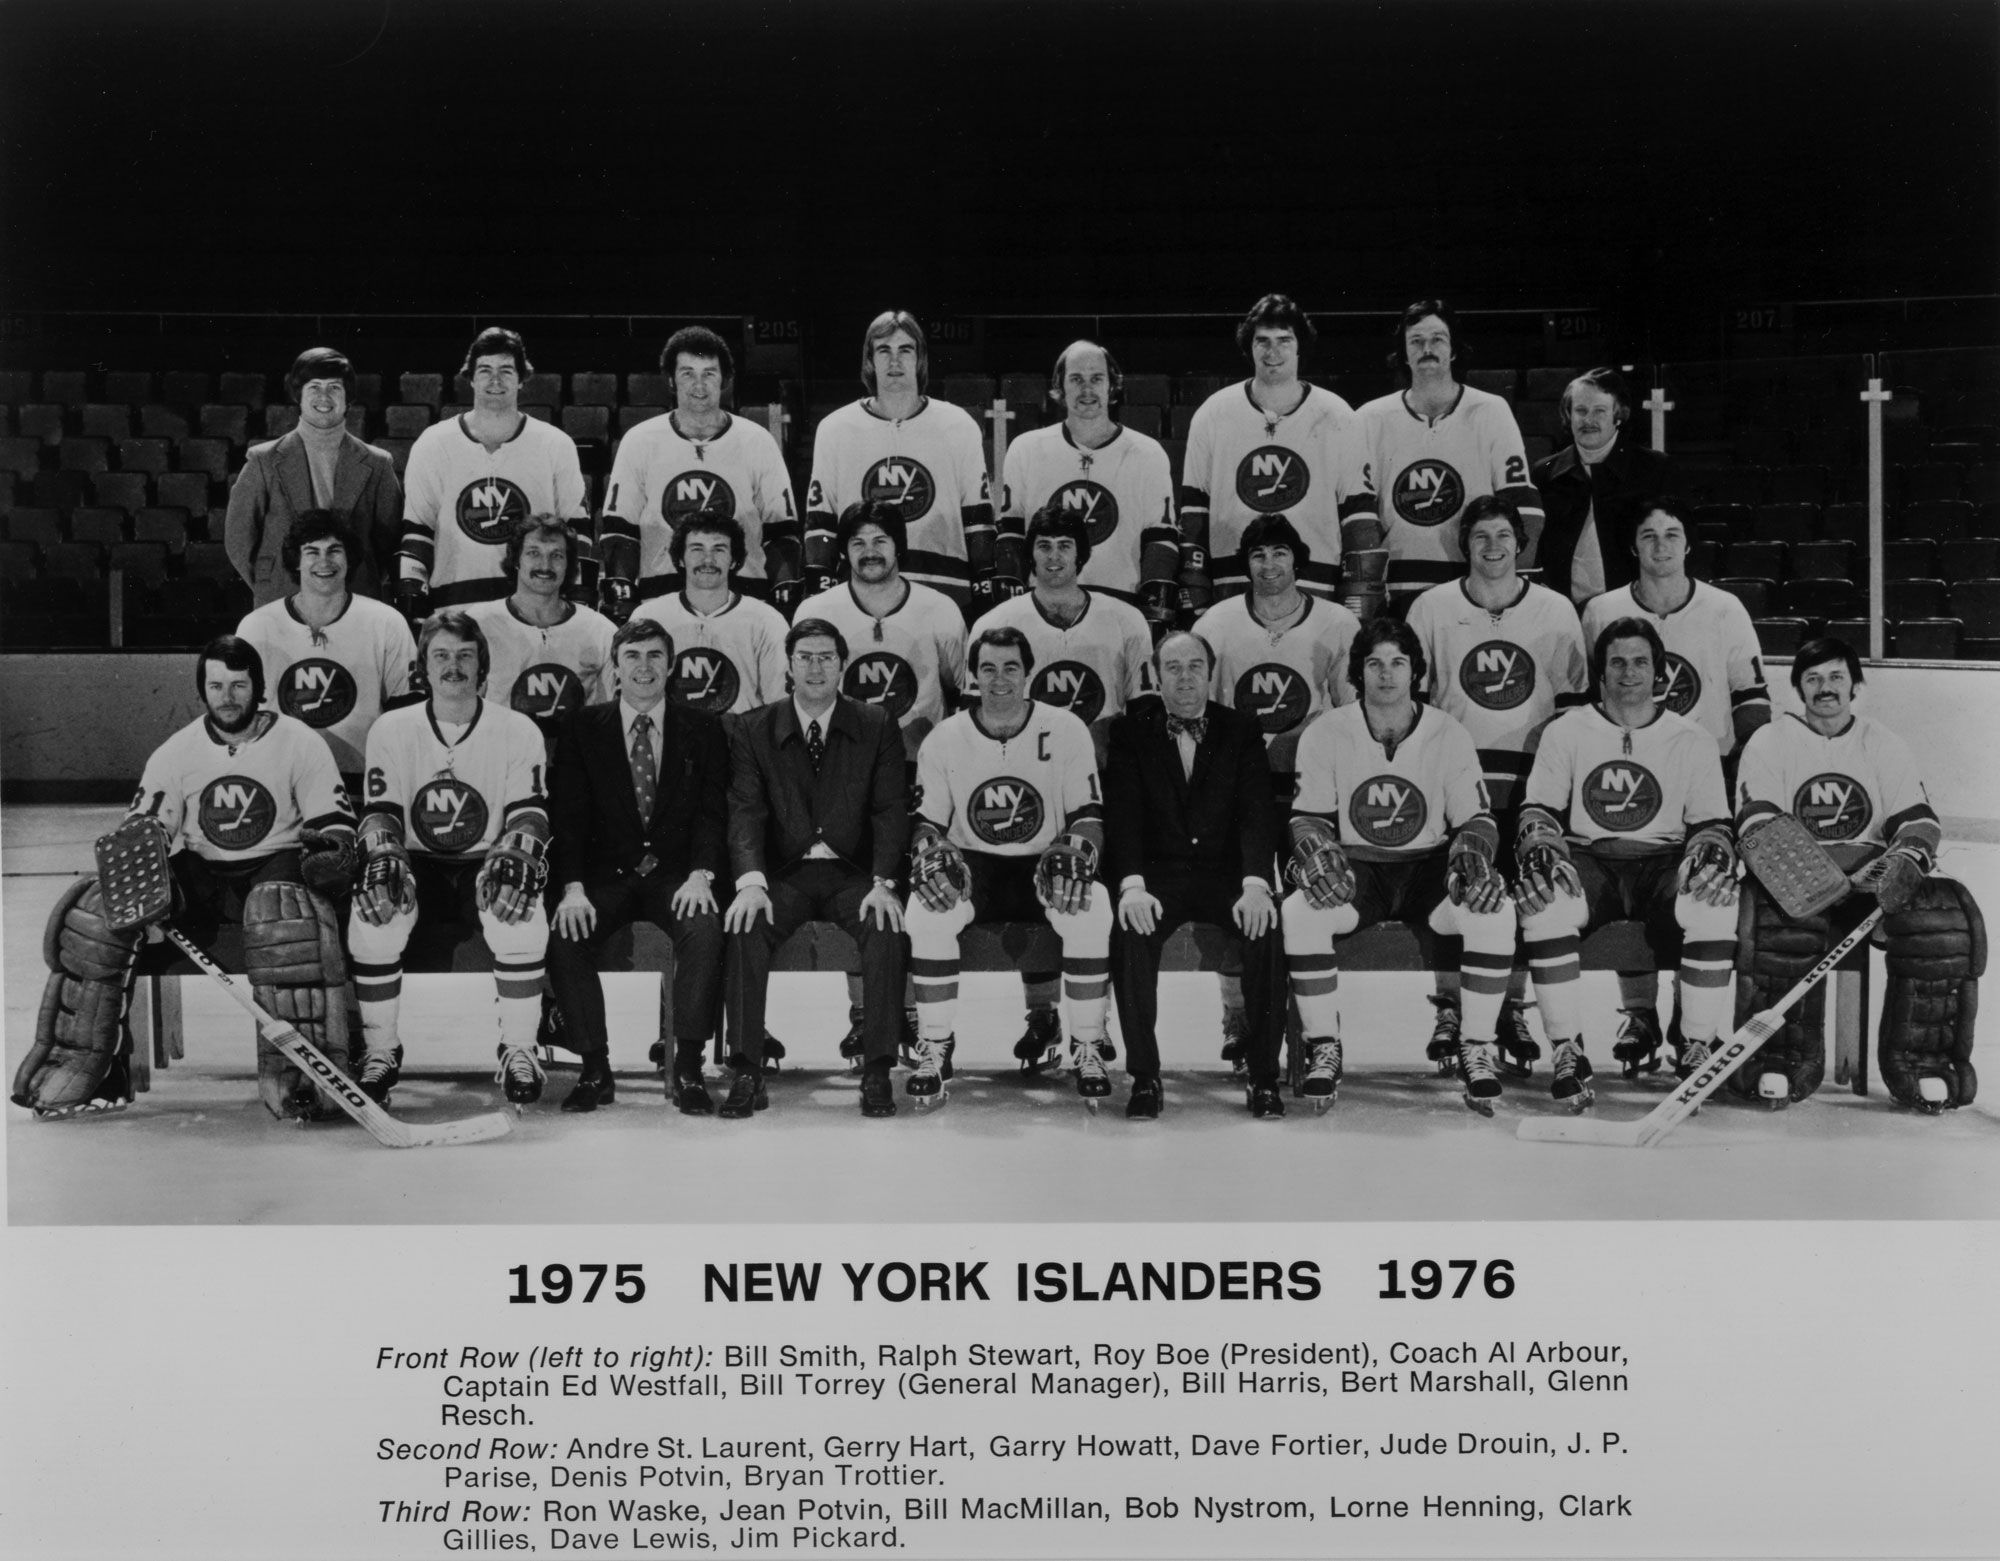 The 1975-76 New York Islanders.